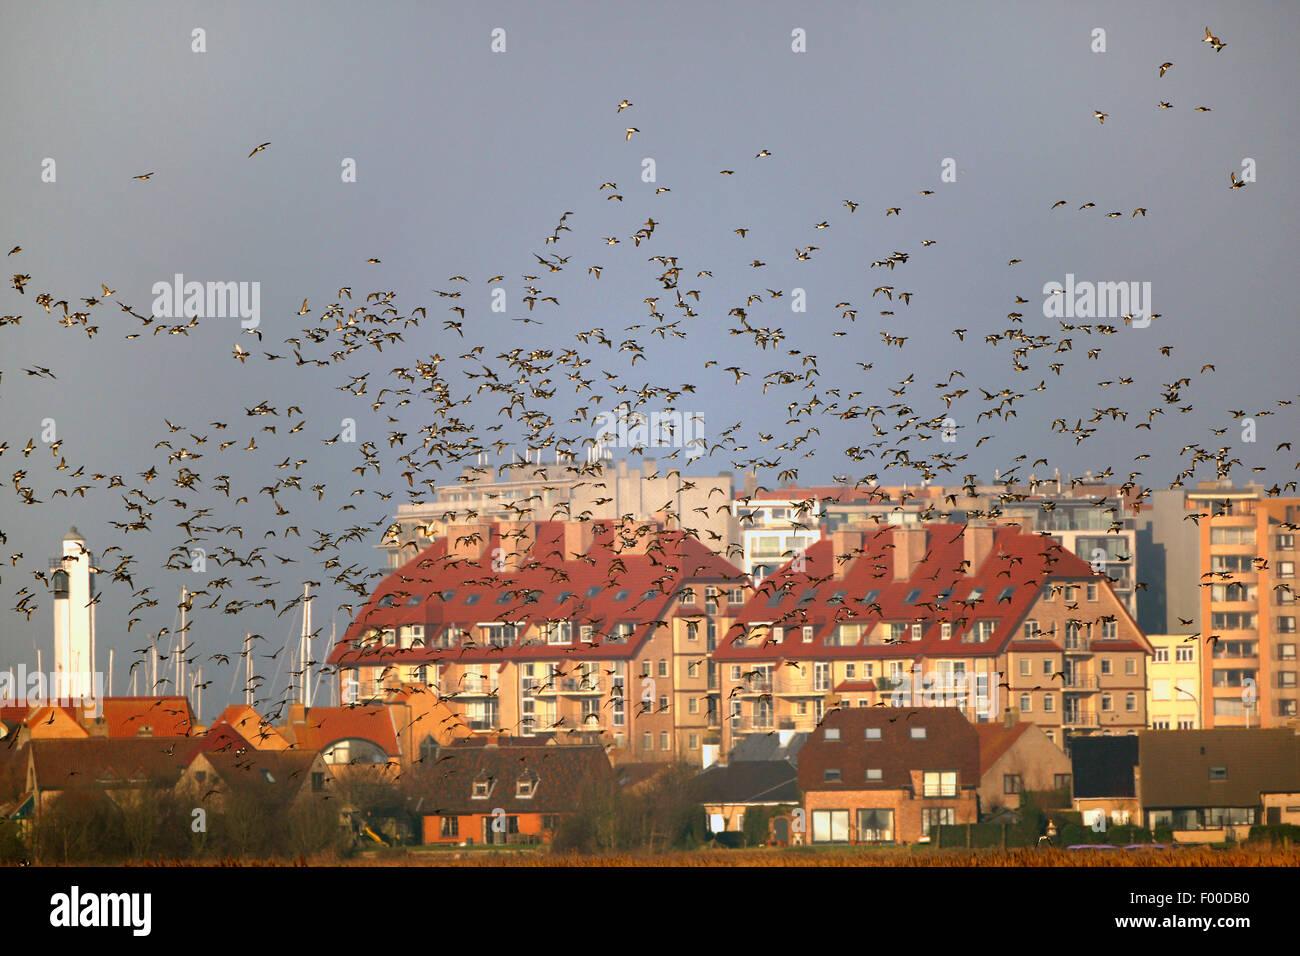 European wigeon (Anas penelope, Mareca penelope), flock in flight above field in winter along appartment buildings, - Stock Image